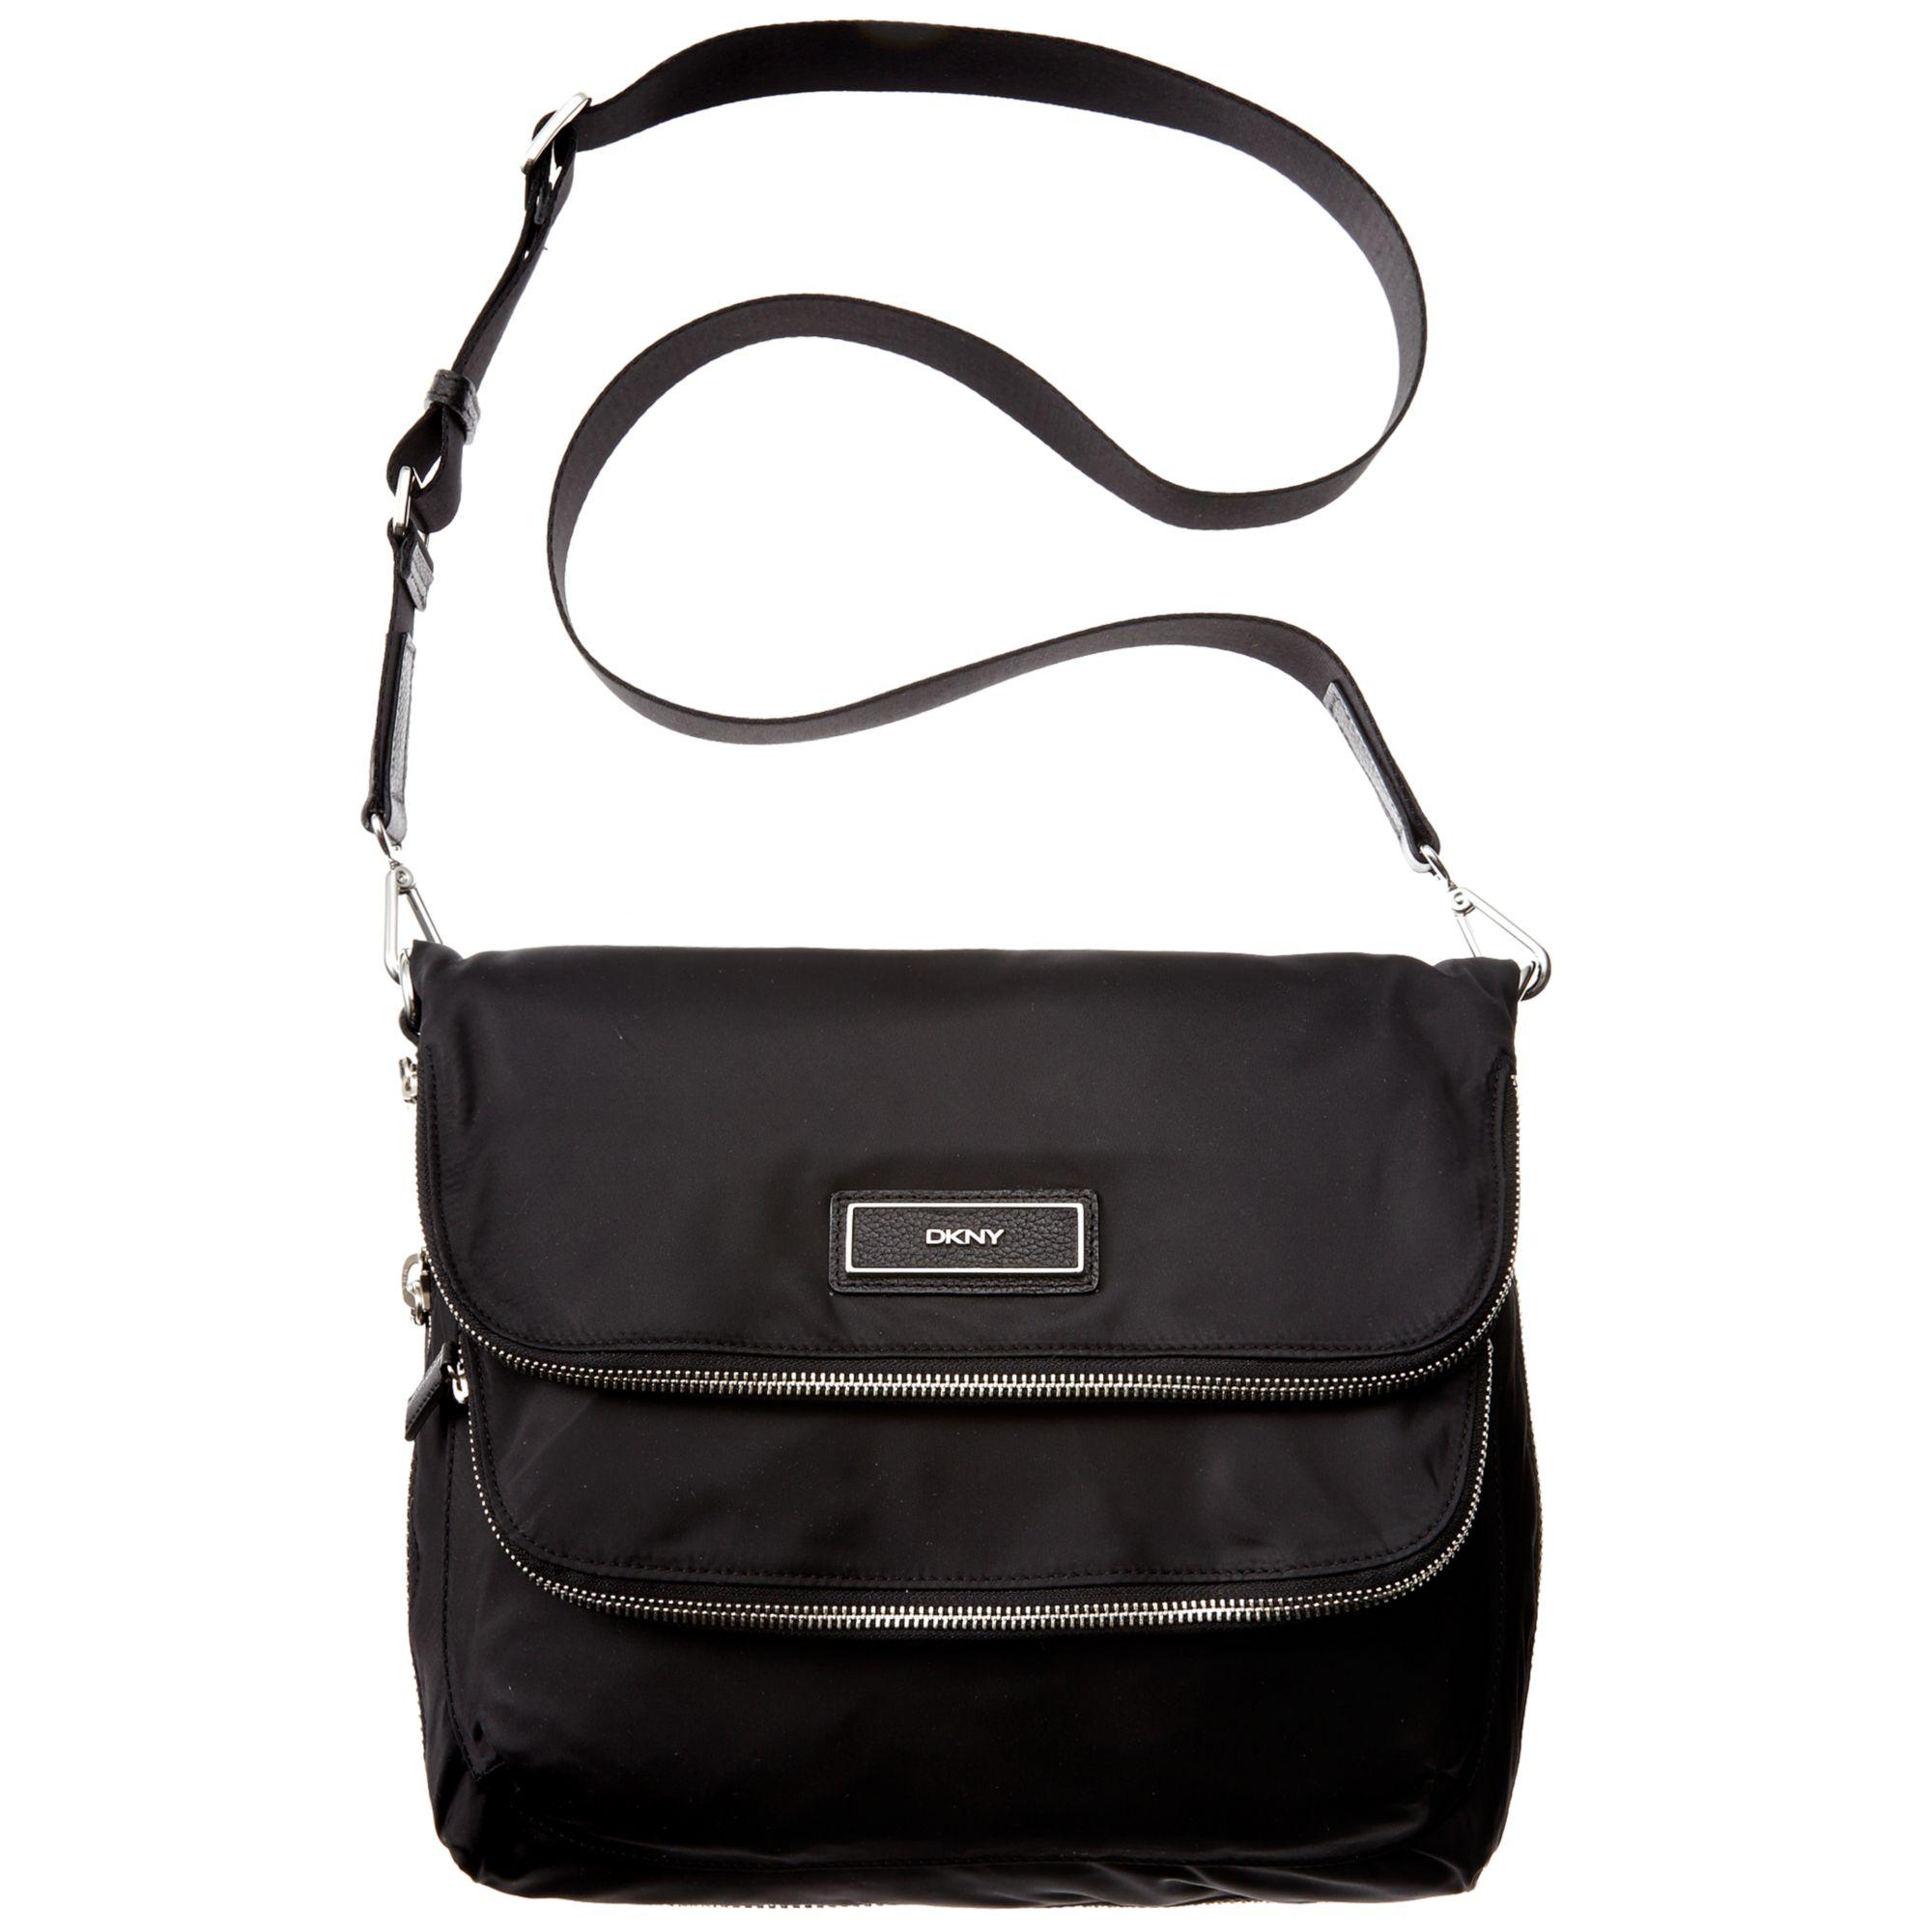 dkny medium nylon messenger bag in black lyst